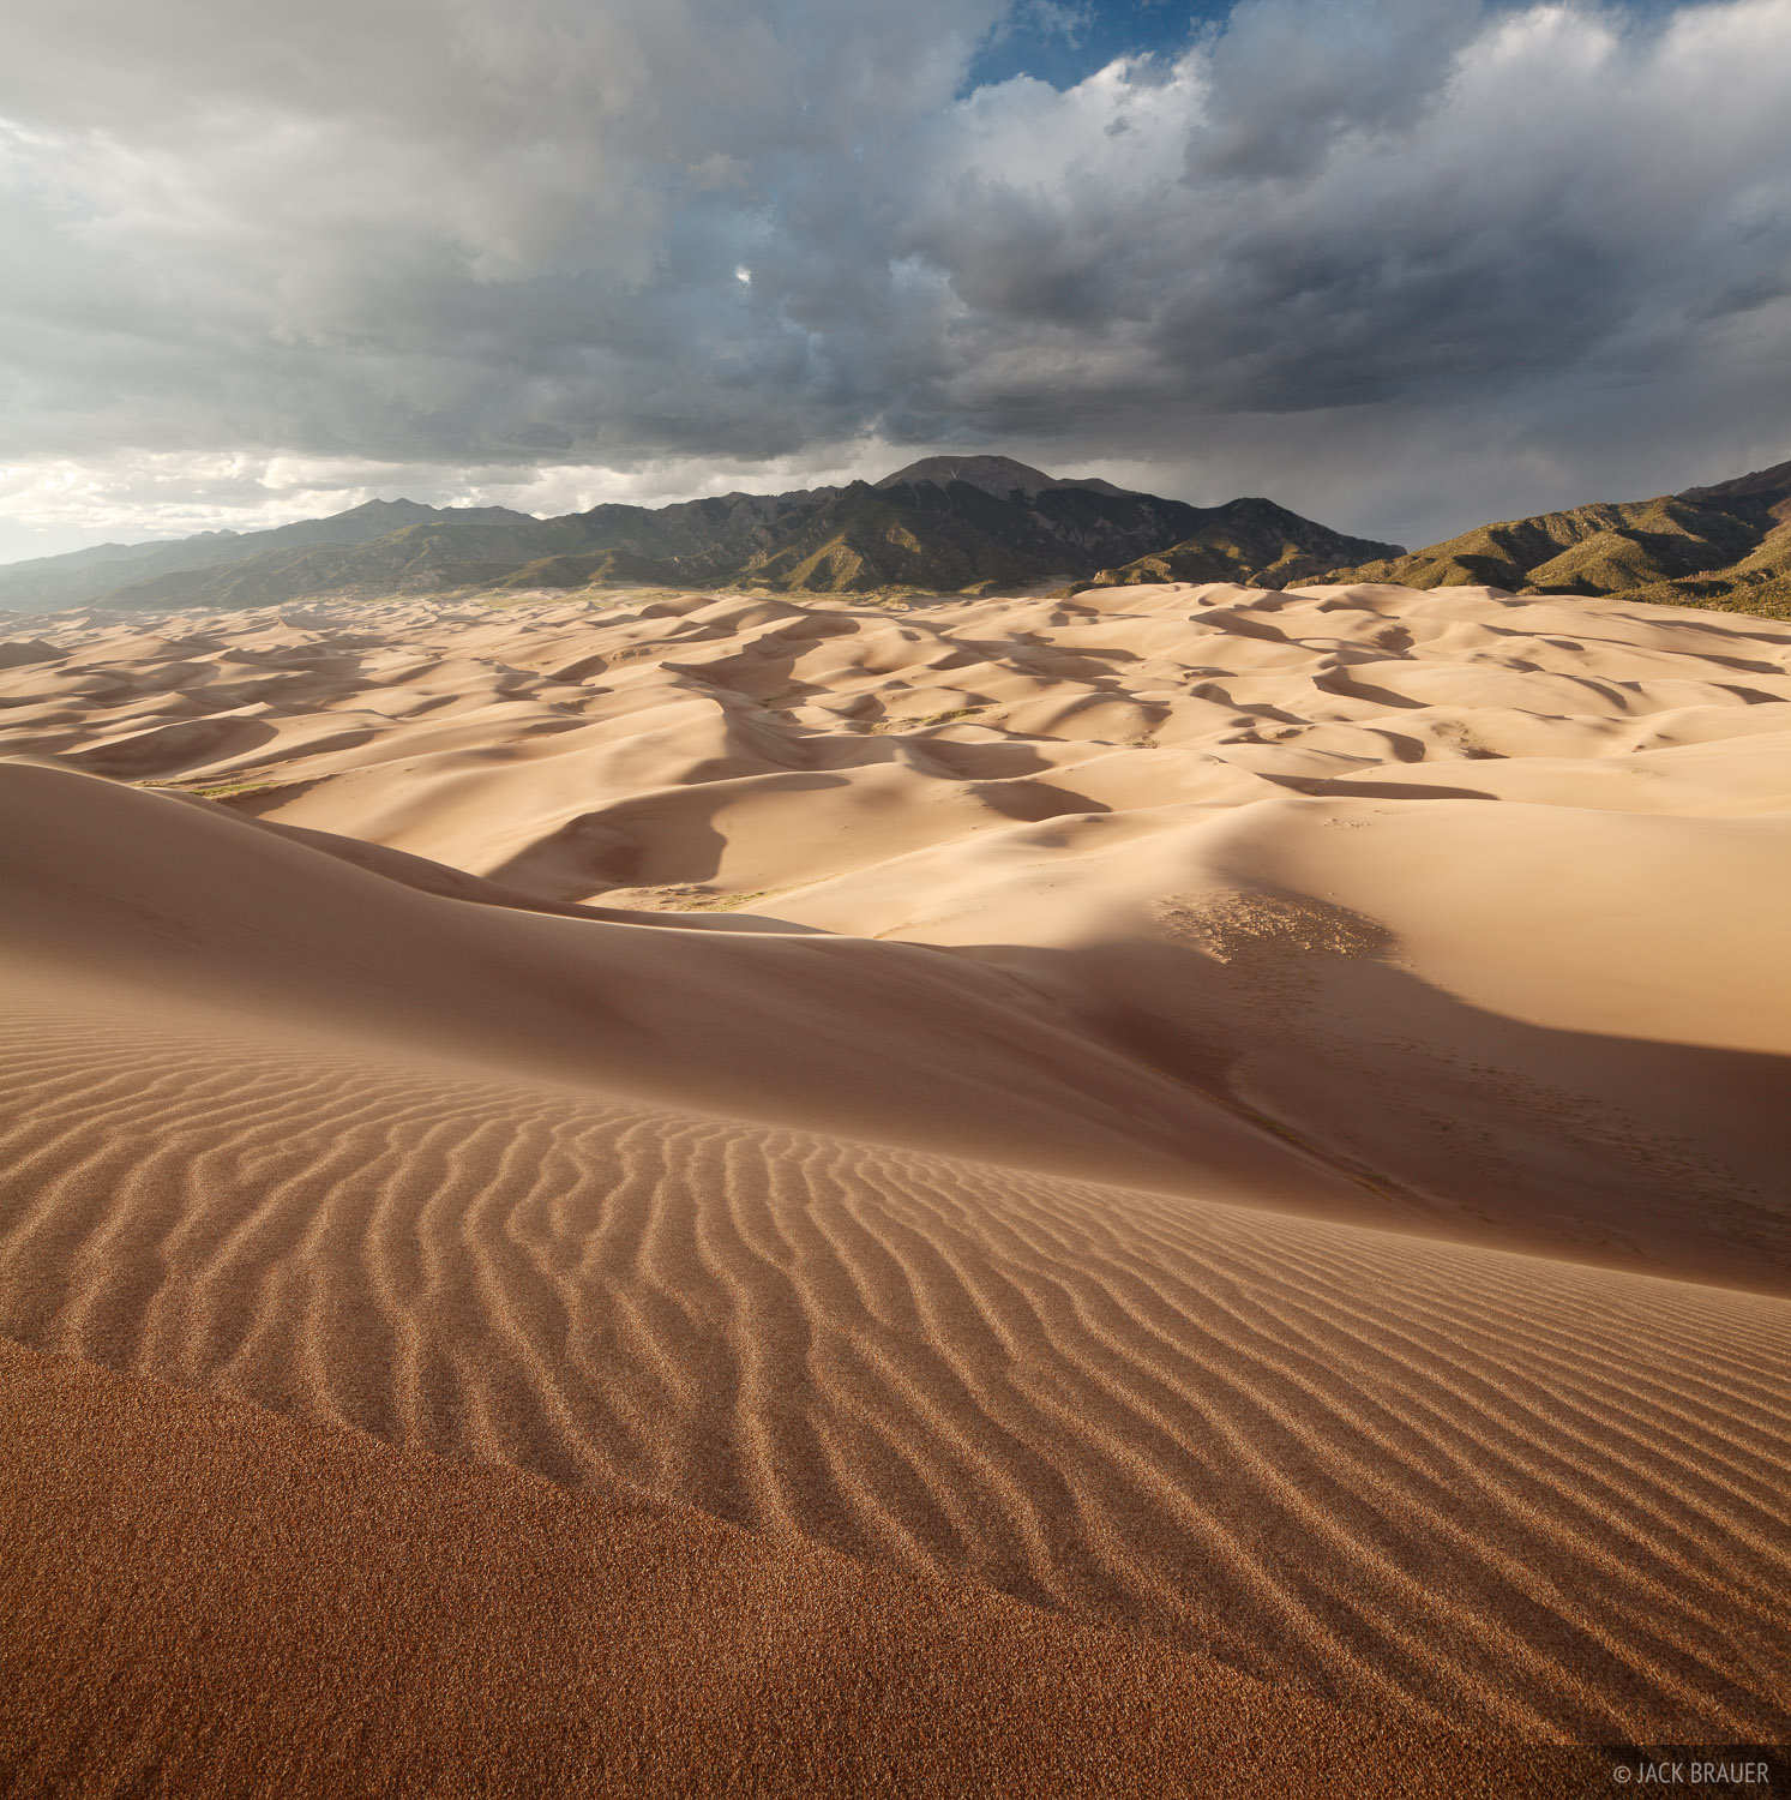 Colorado,Great Sand Dunes,dunes, Sangre de Cristos, photo